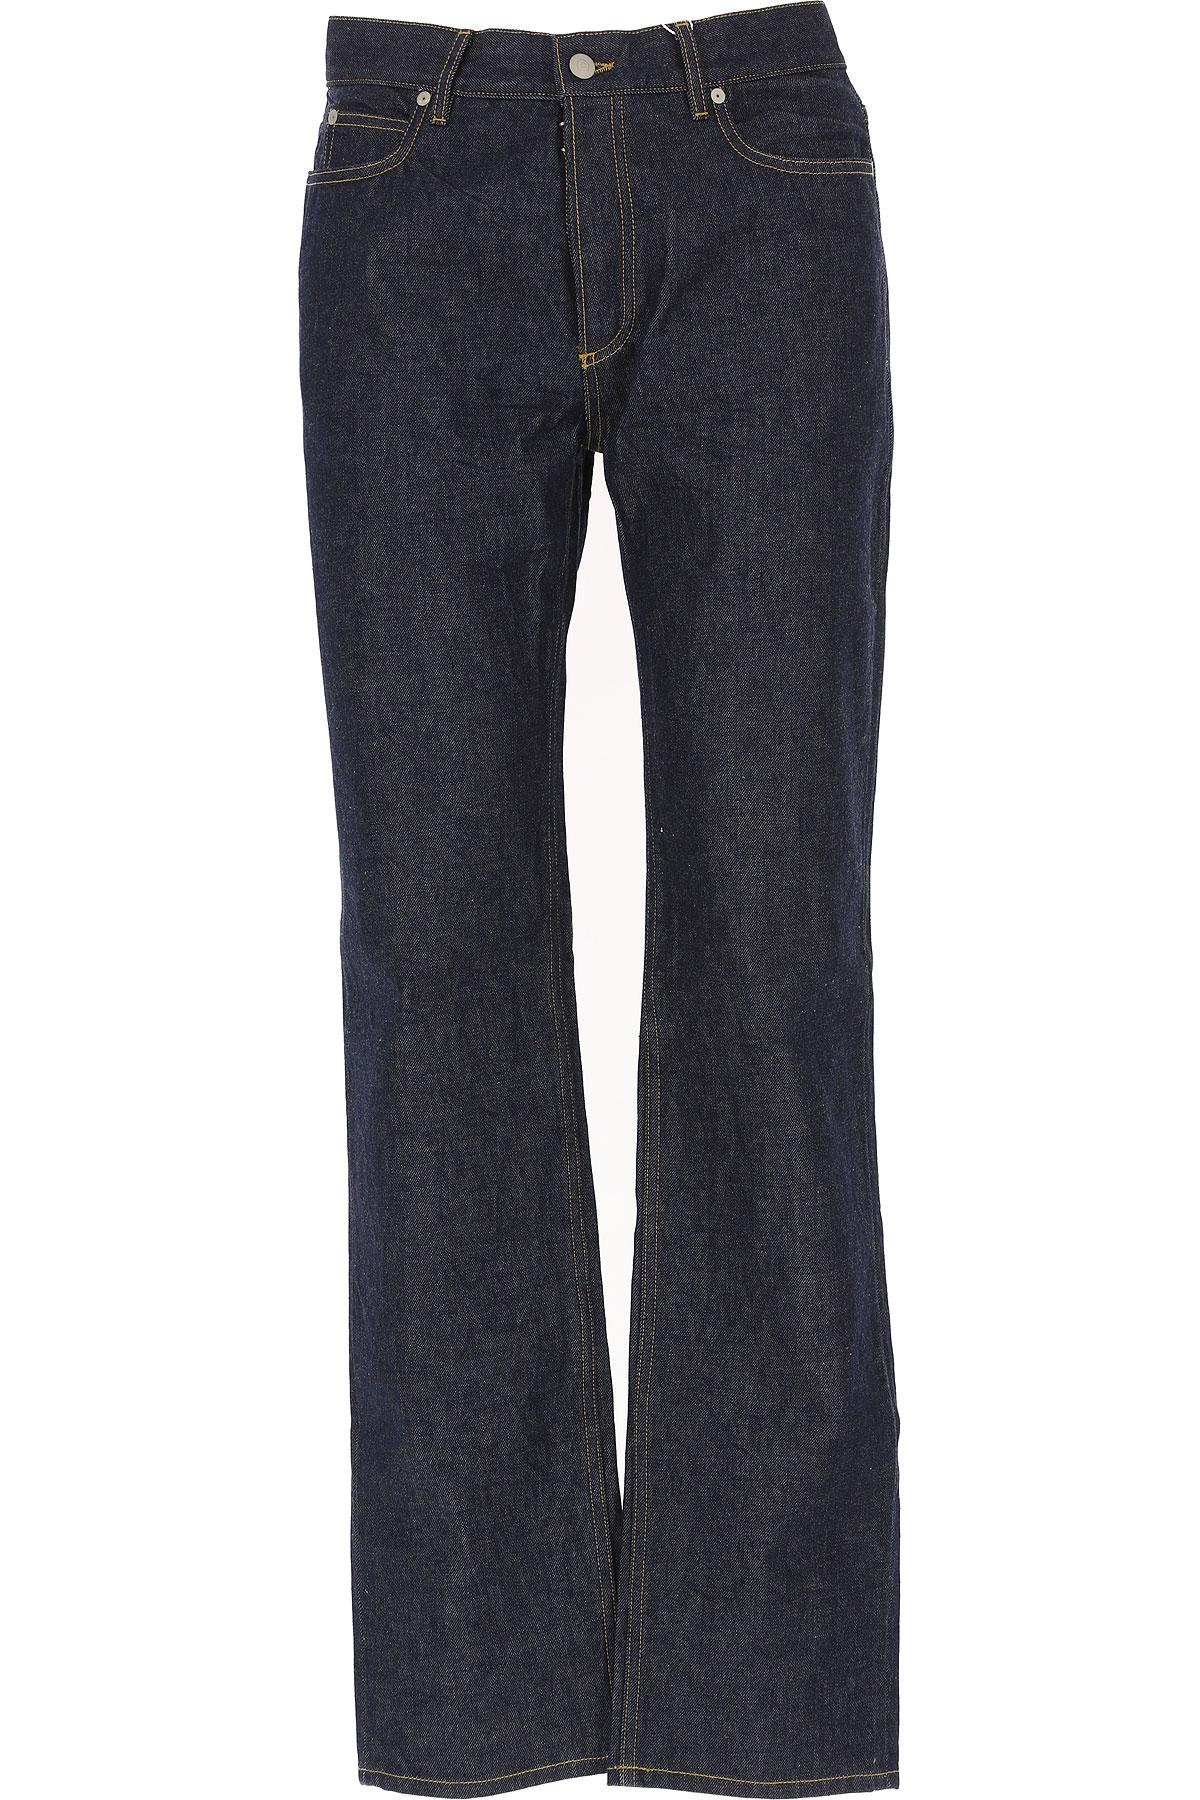 Maison Martin Margiela Jeans On Sale, Denim Blue, Cotton, 2017, 30 31 32 USA-462300